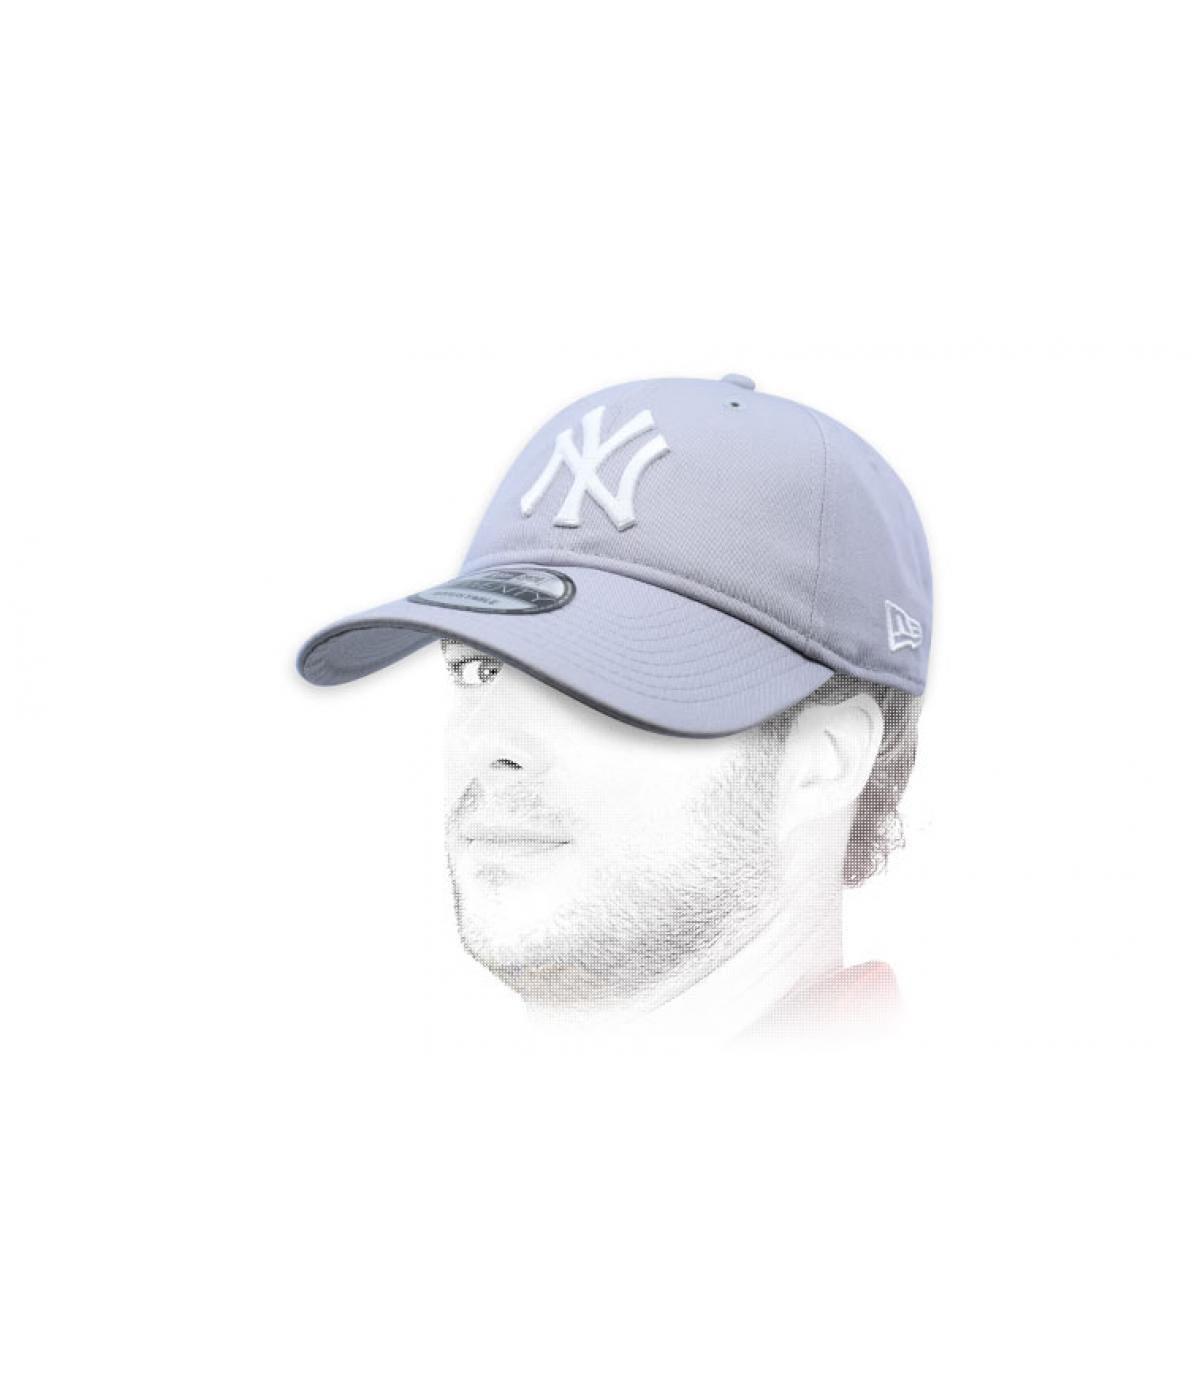 gorra NY gris plegable